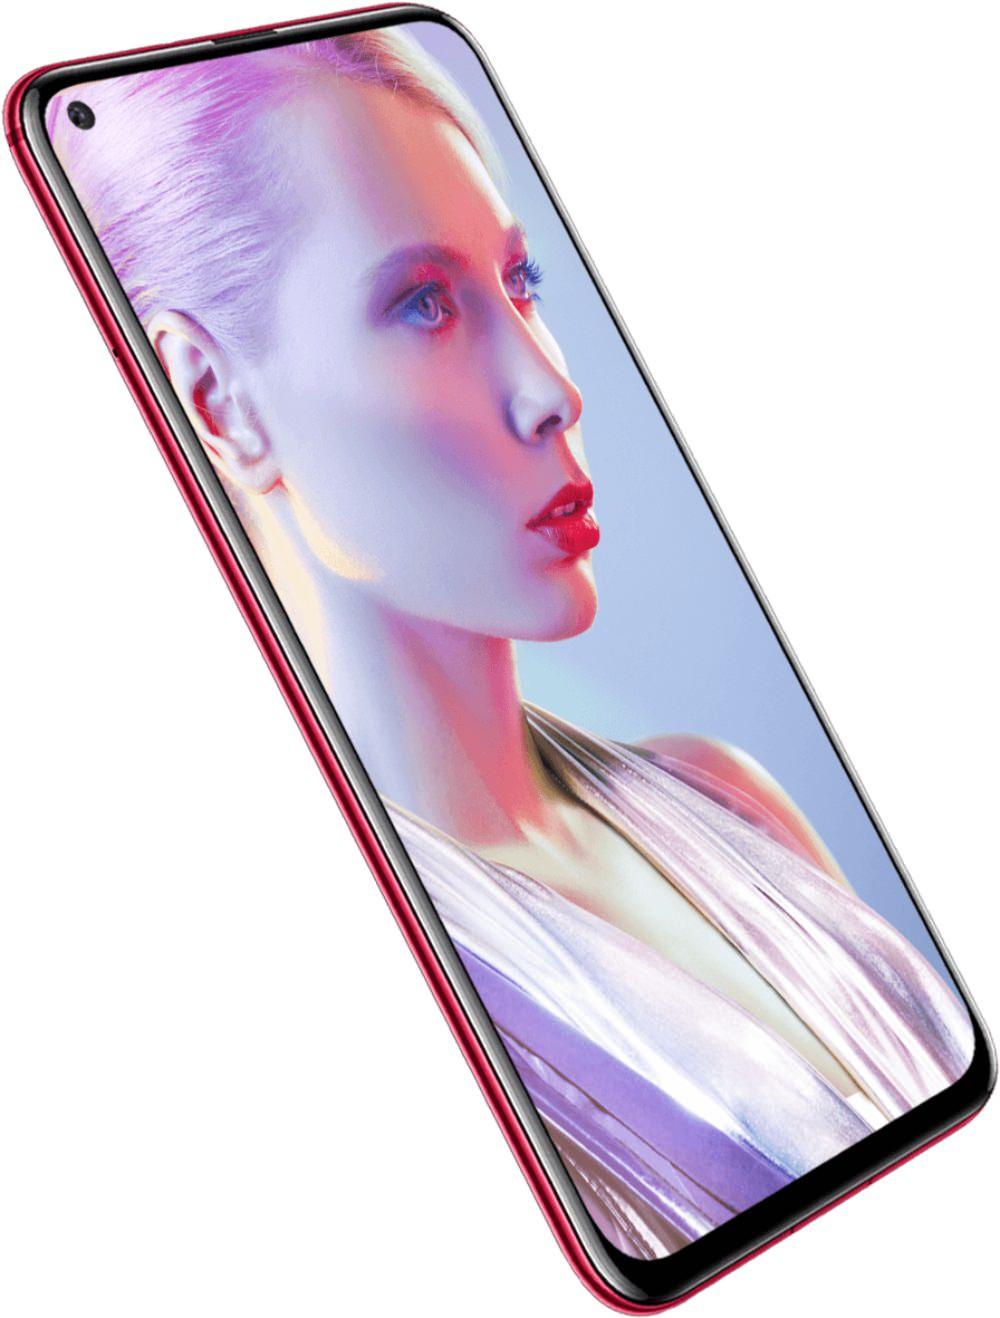 buy huawei nova 4 4g smartphone